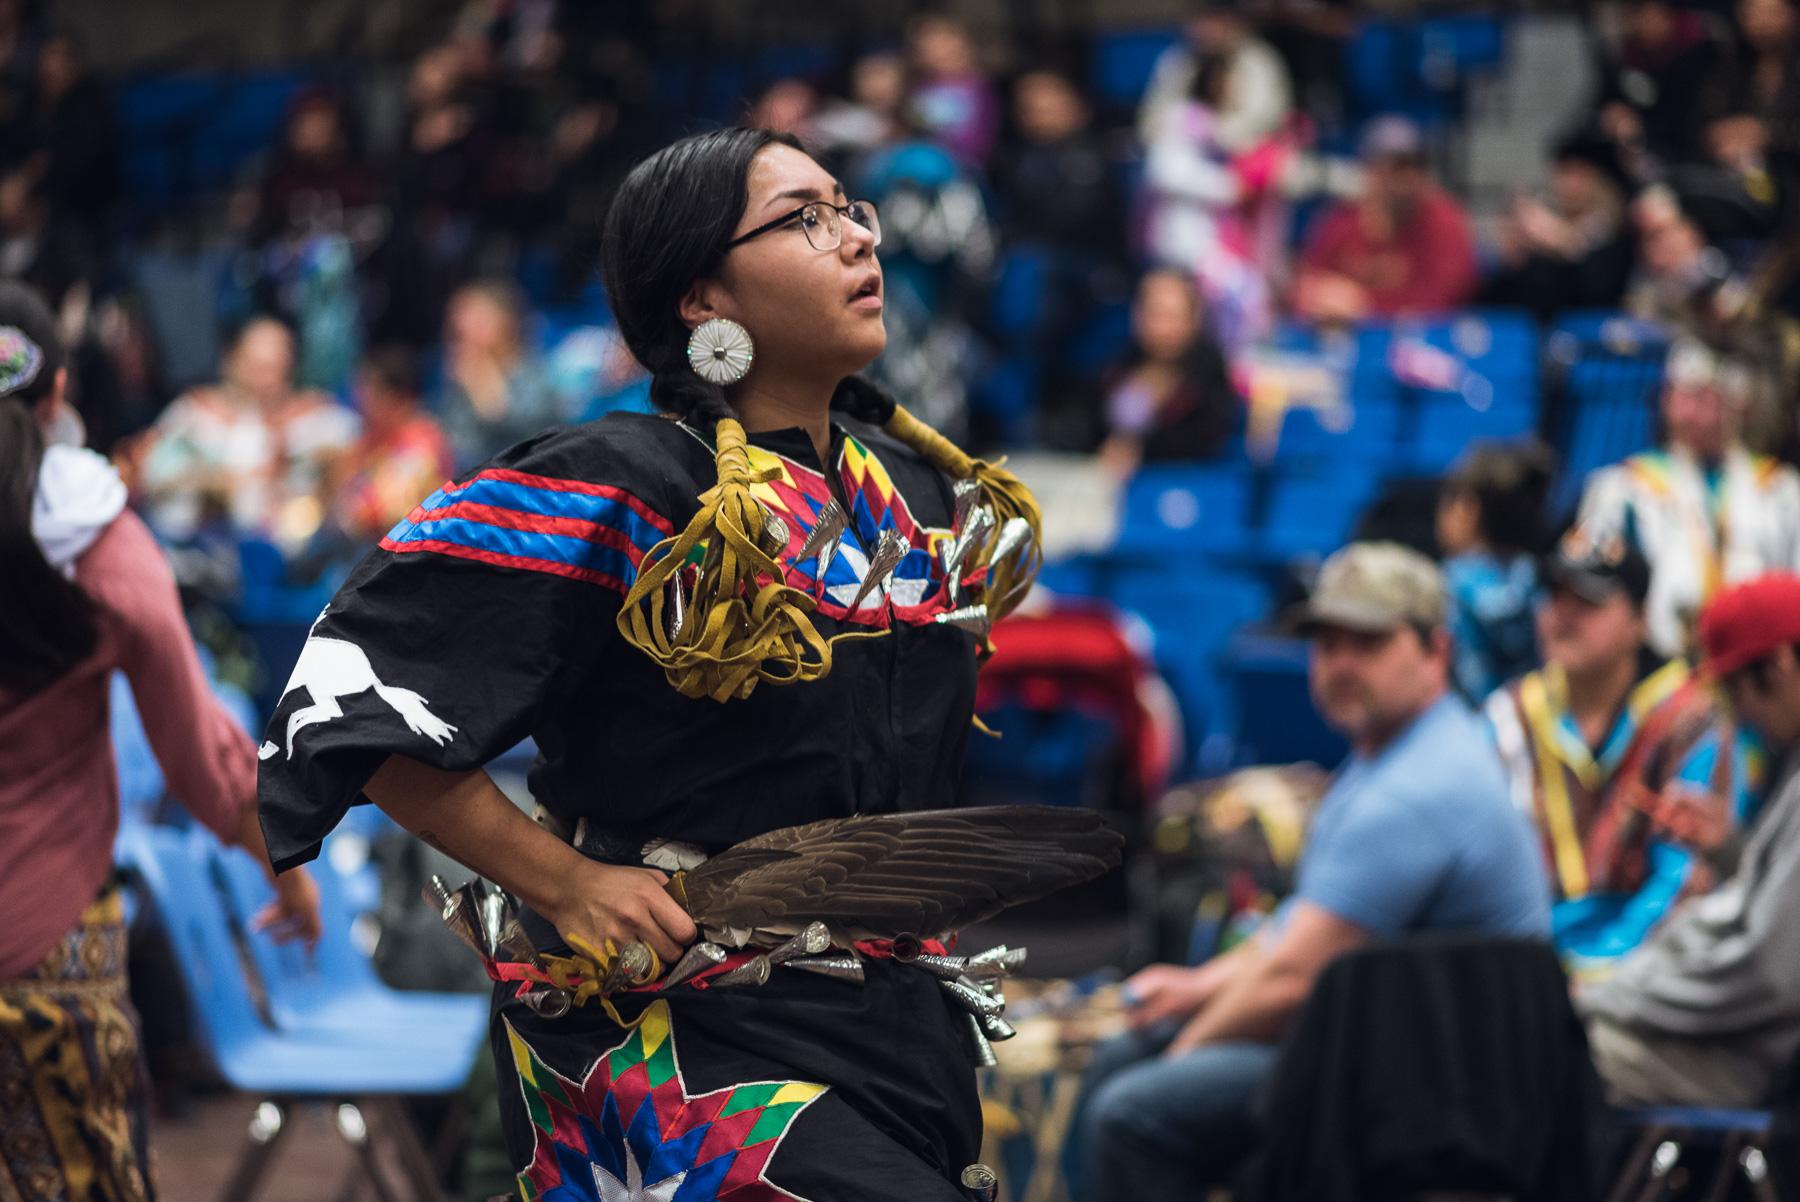 31st-Annual-LUNSA-Powwow-Blog-121.jpg